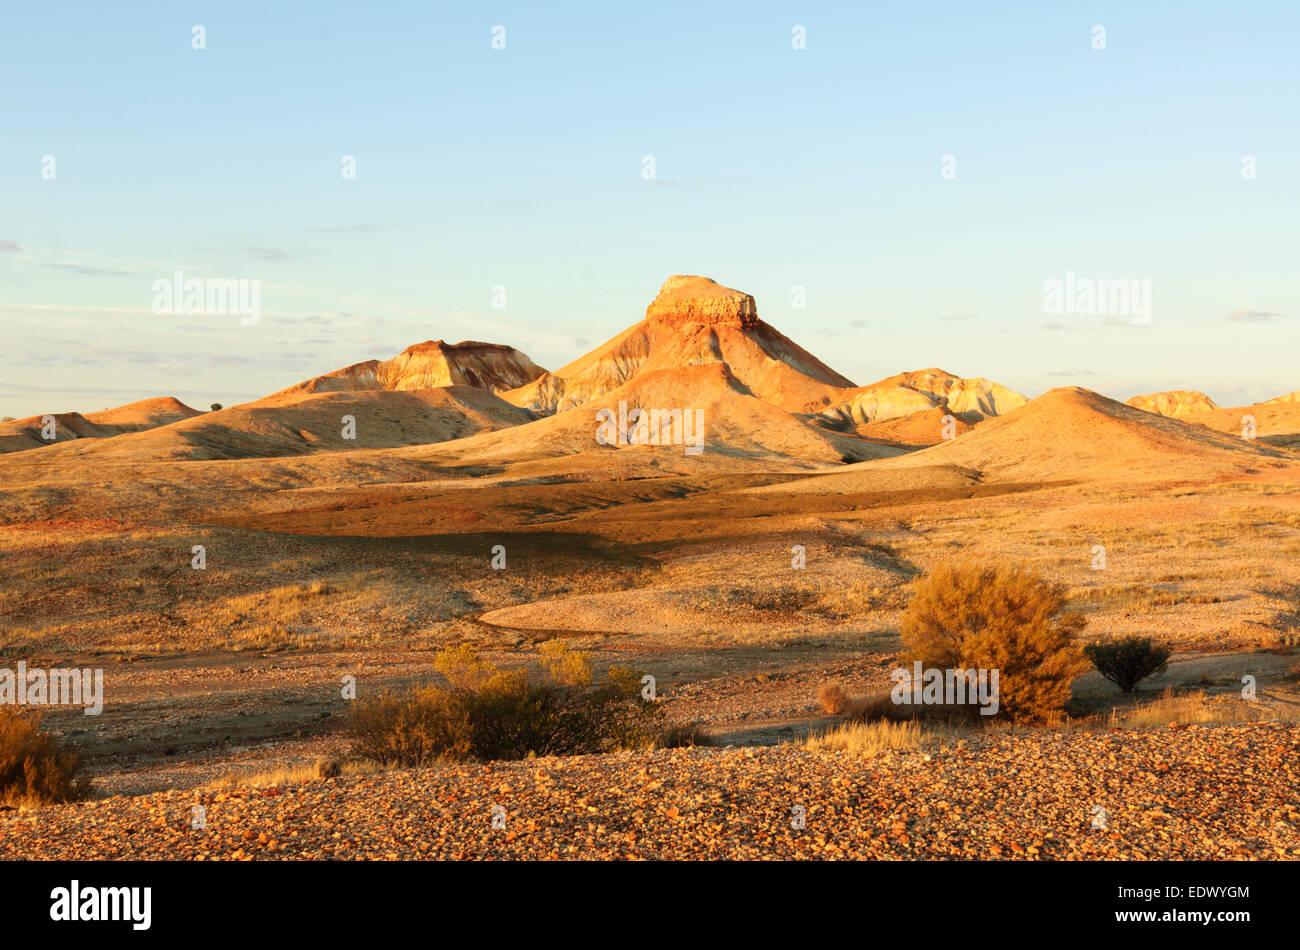 Painted Desert, South Australia - Stock Image